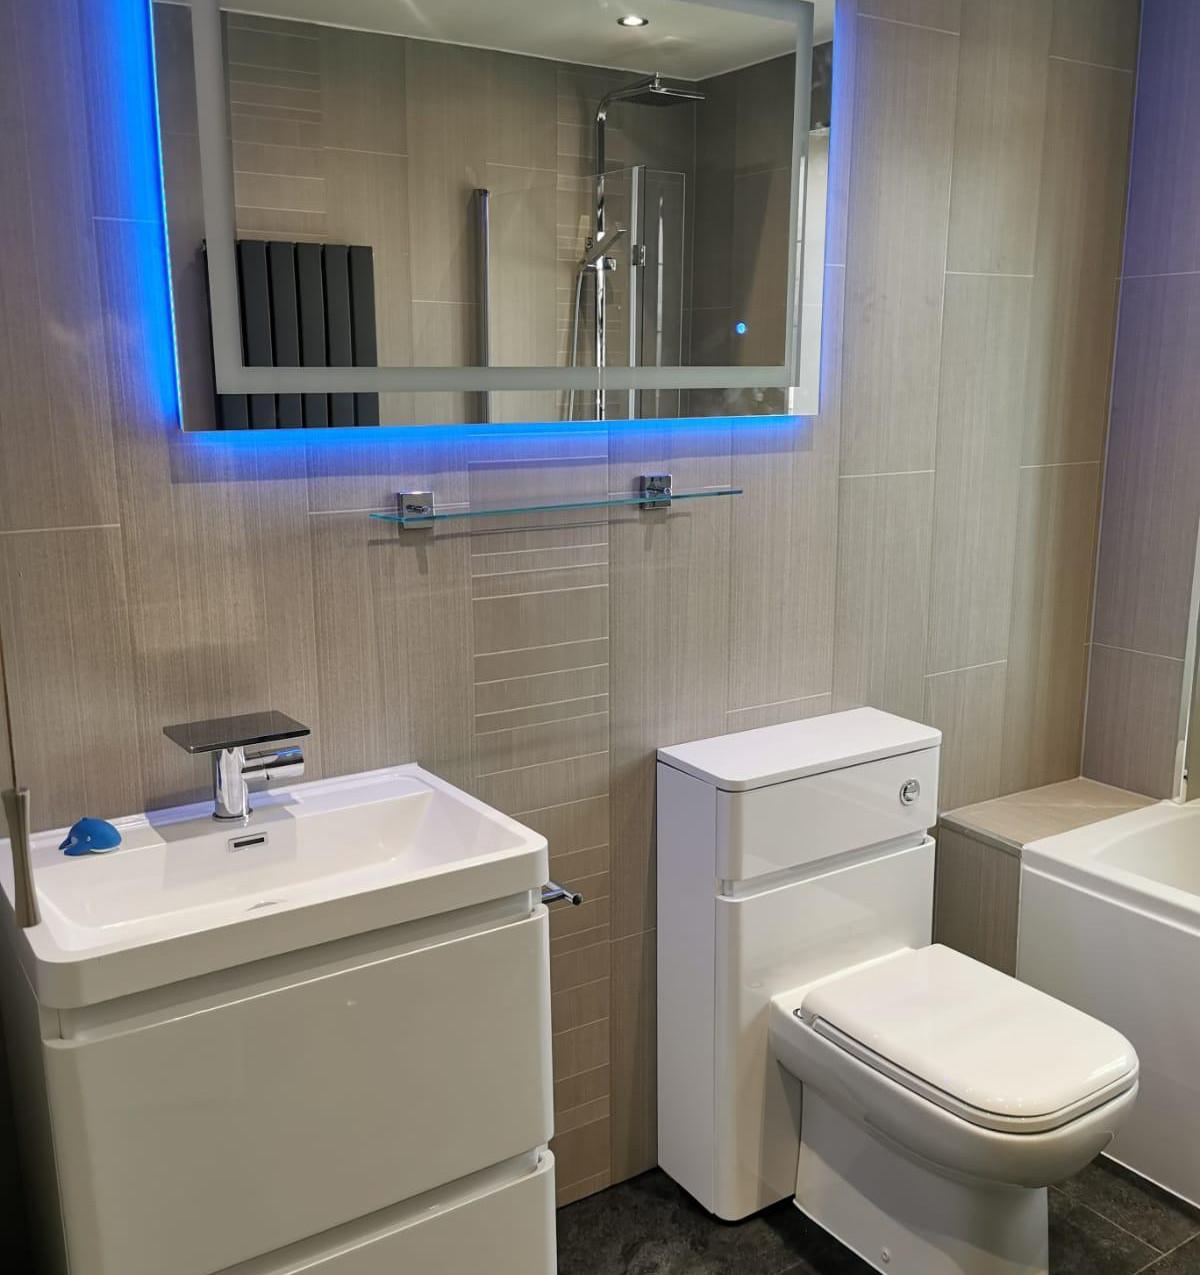 Oldham Bathrooms & Fitting